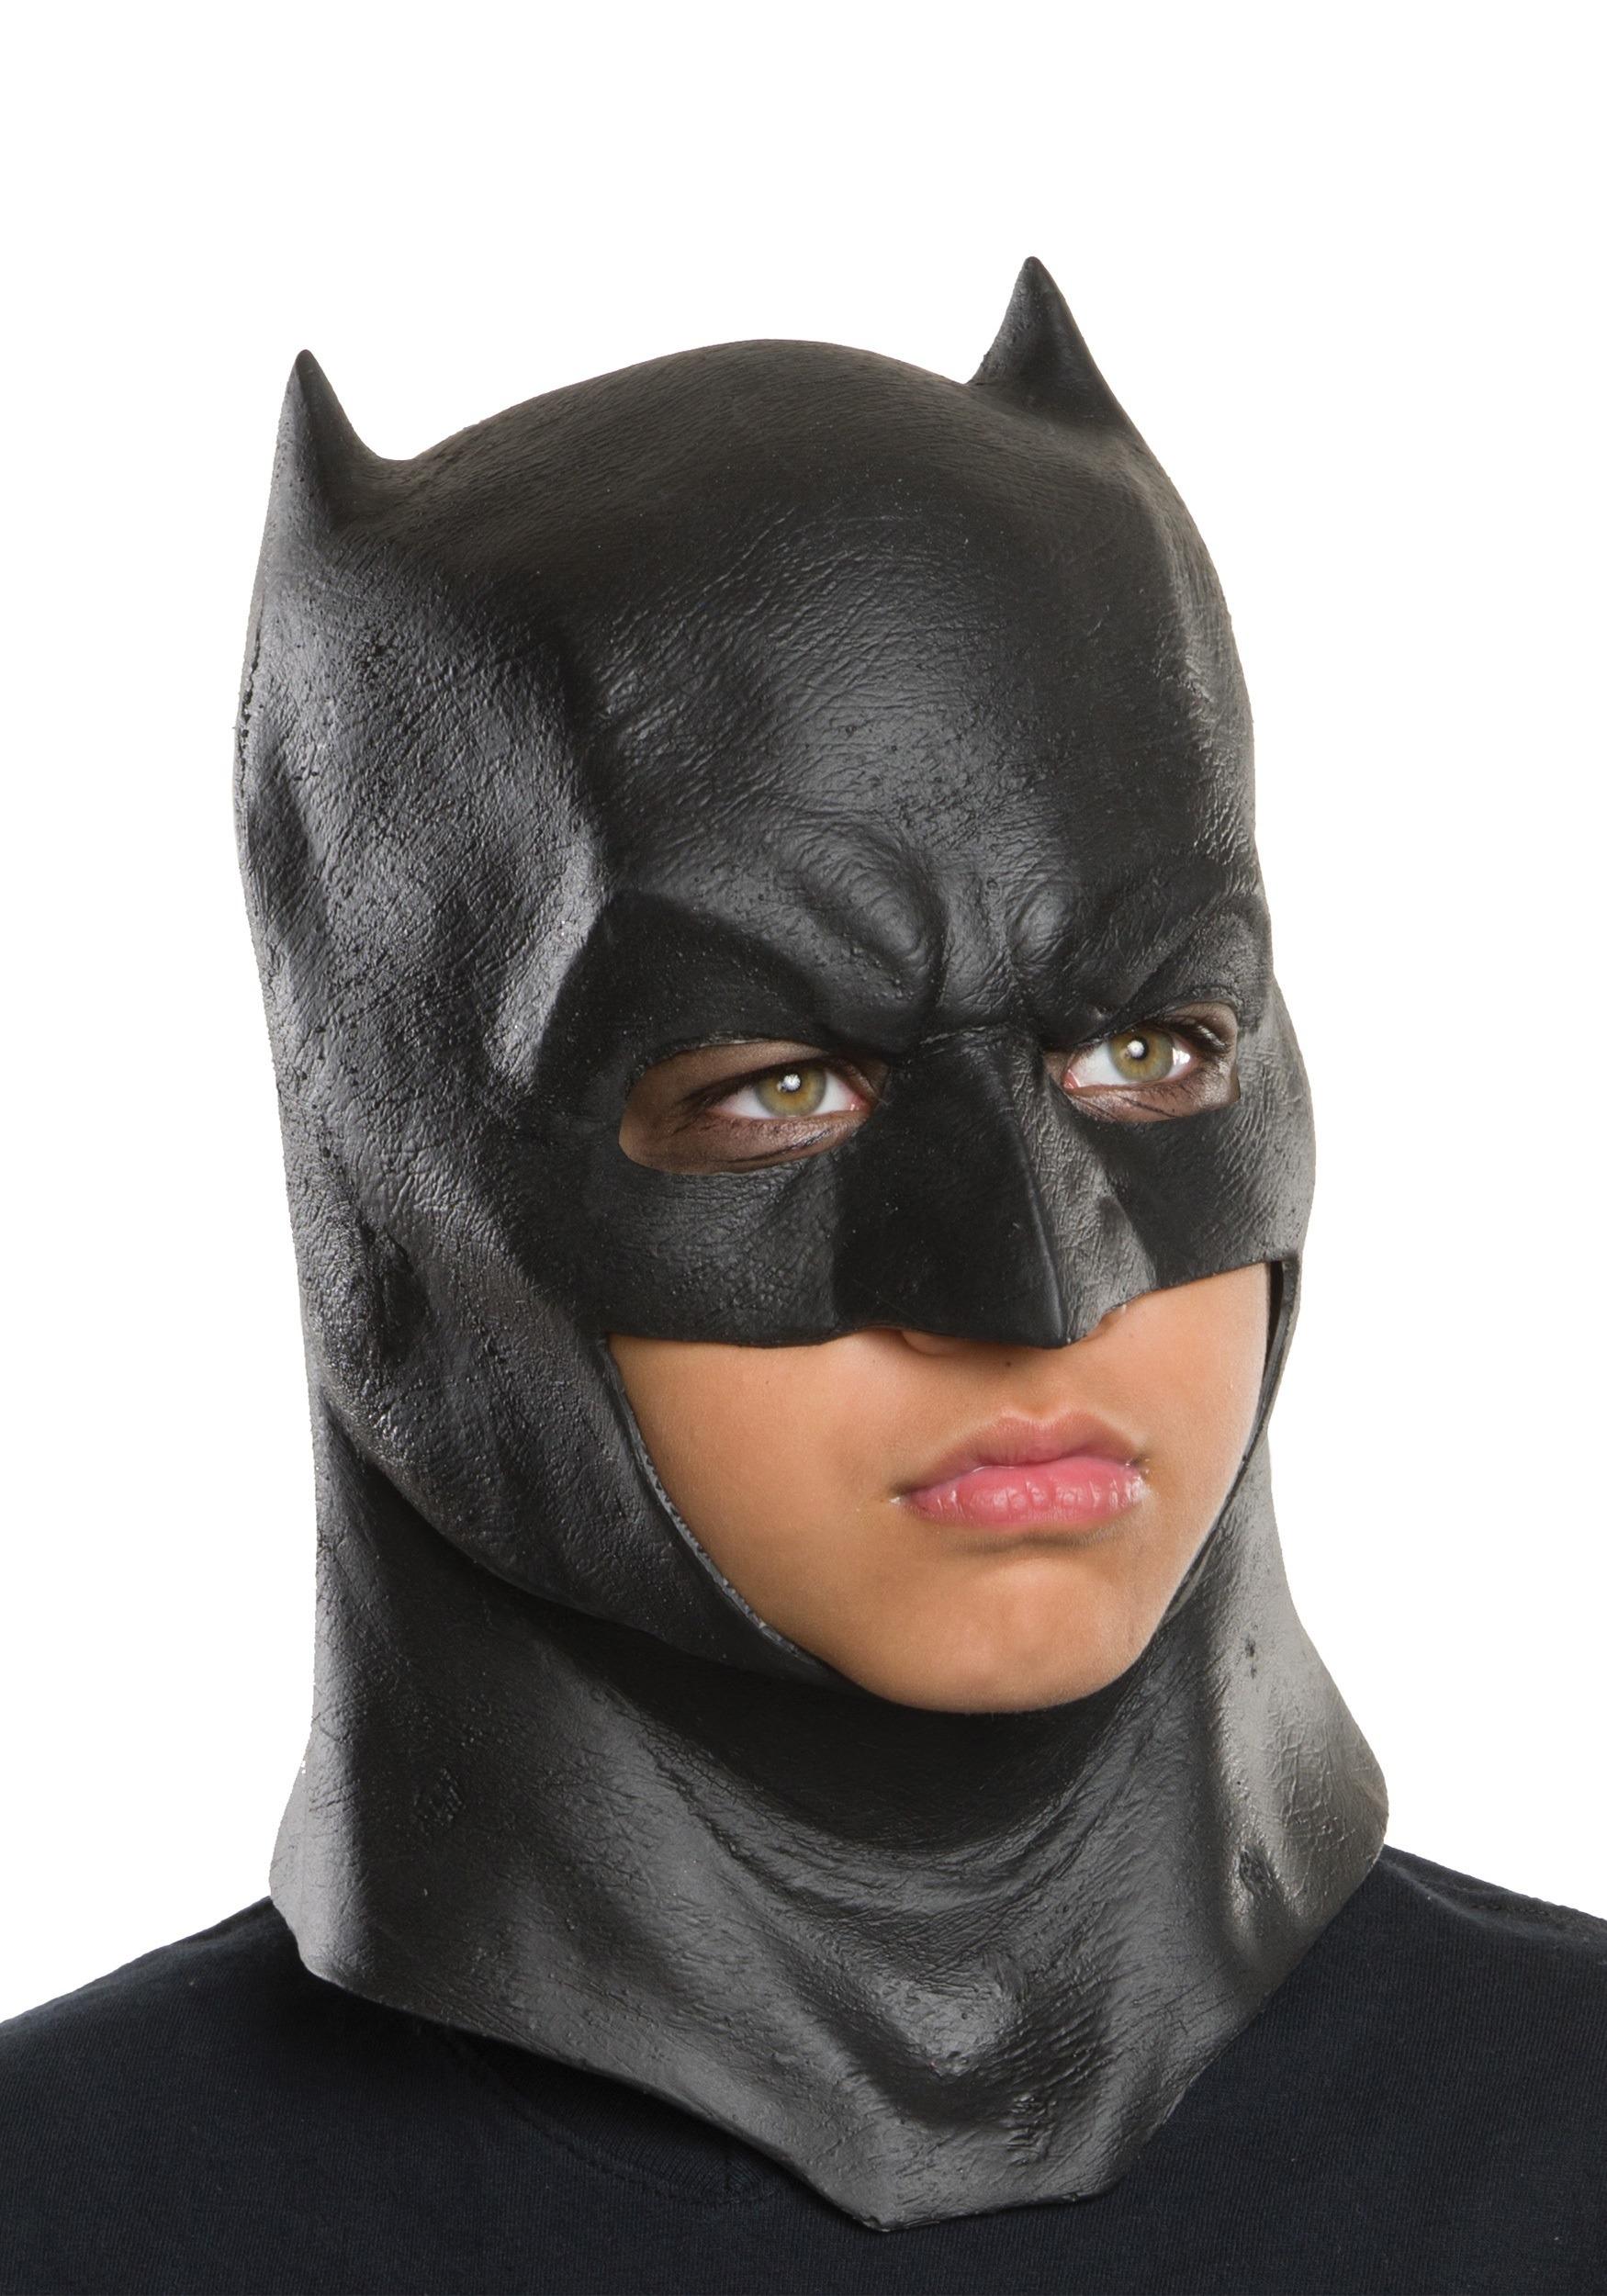 Superhero Masks - Halloween Superhero Masks